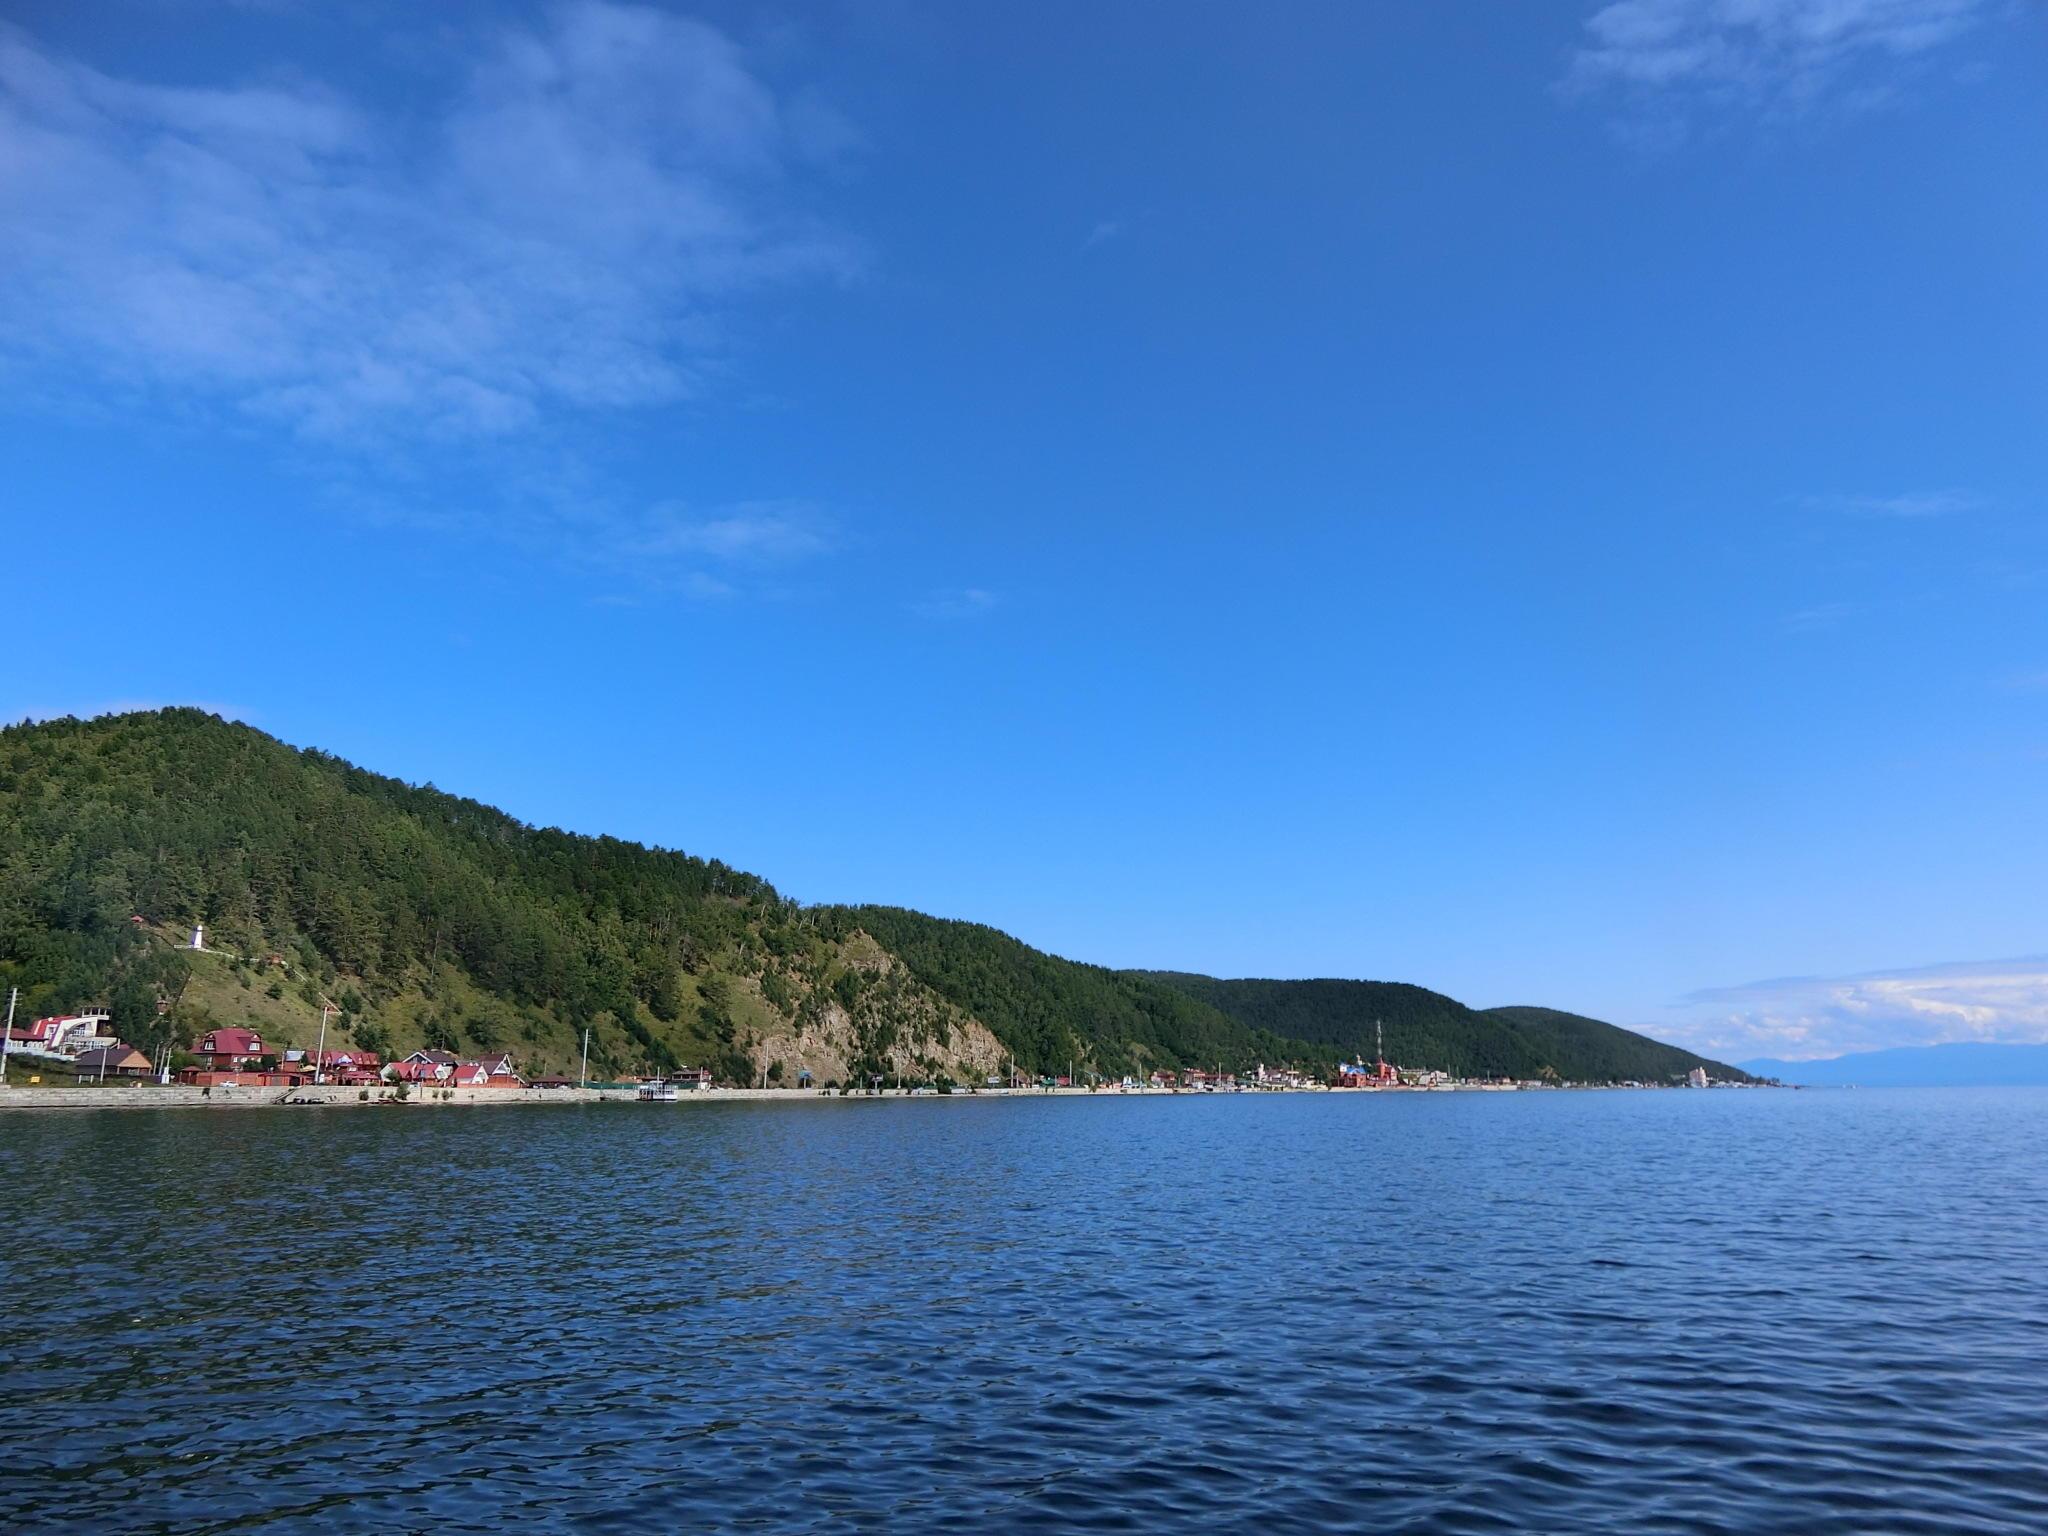 S7航空直行便でロシア イルクーツクへ 透明度世界一のバイカル湖で